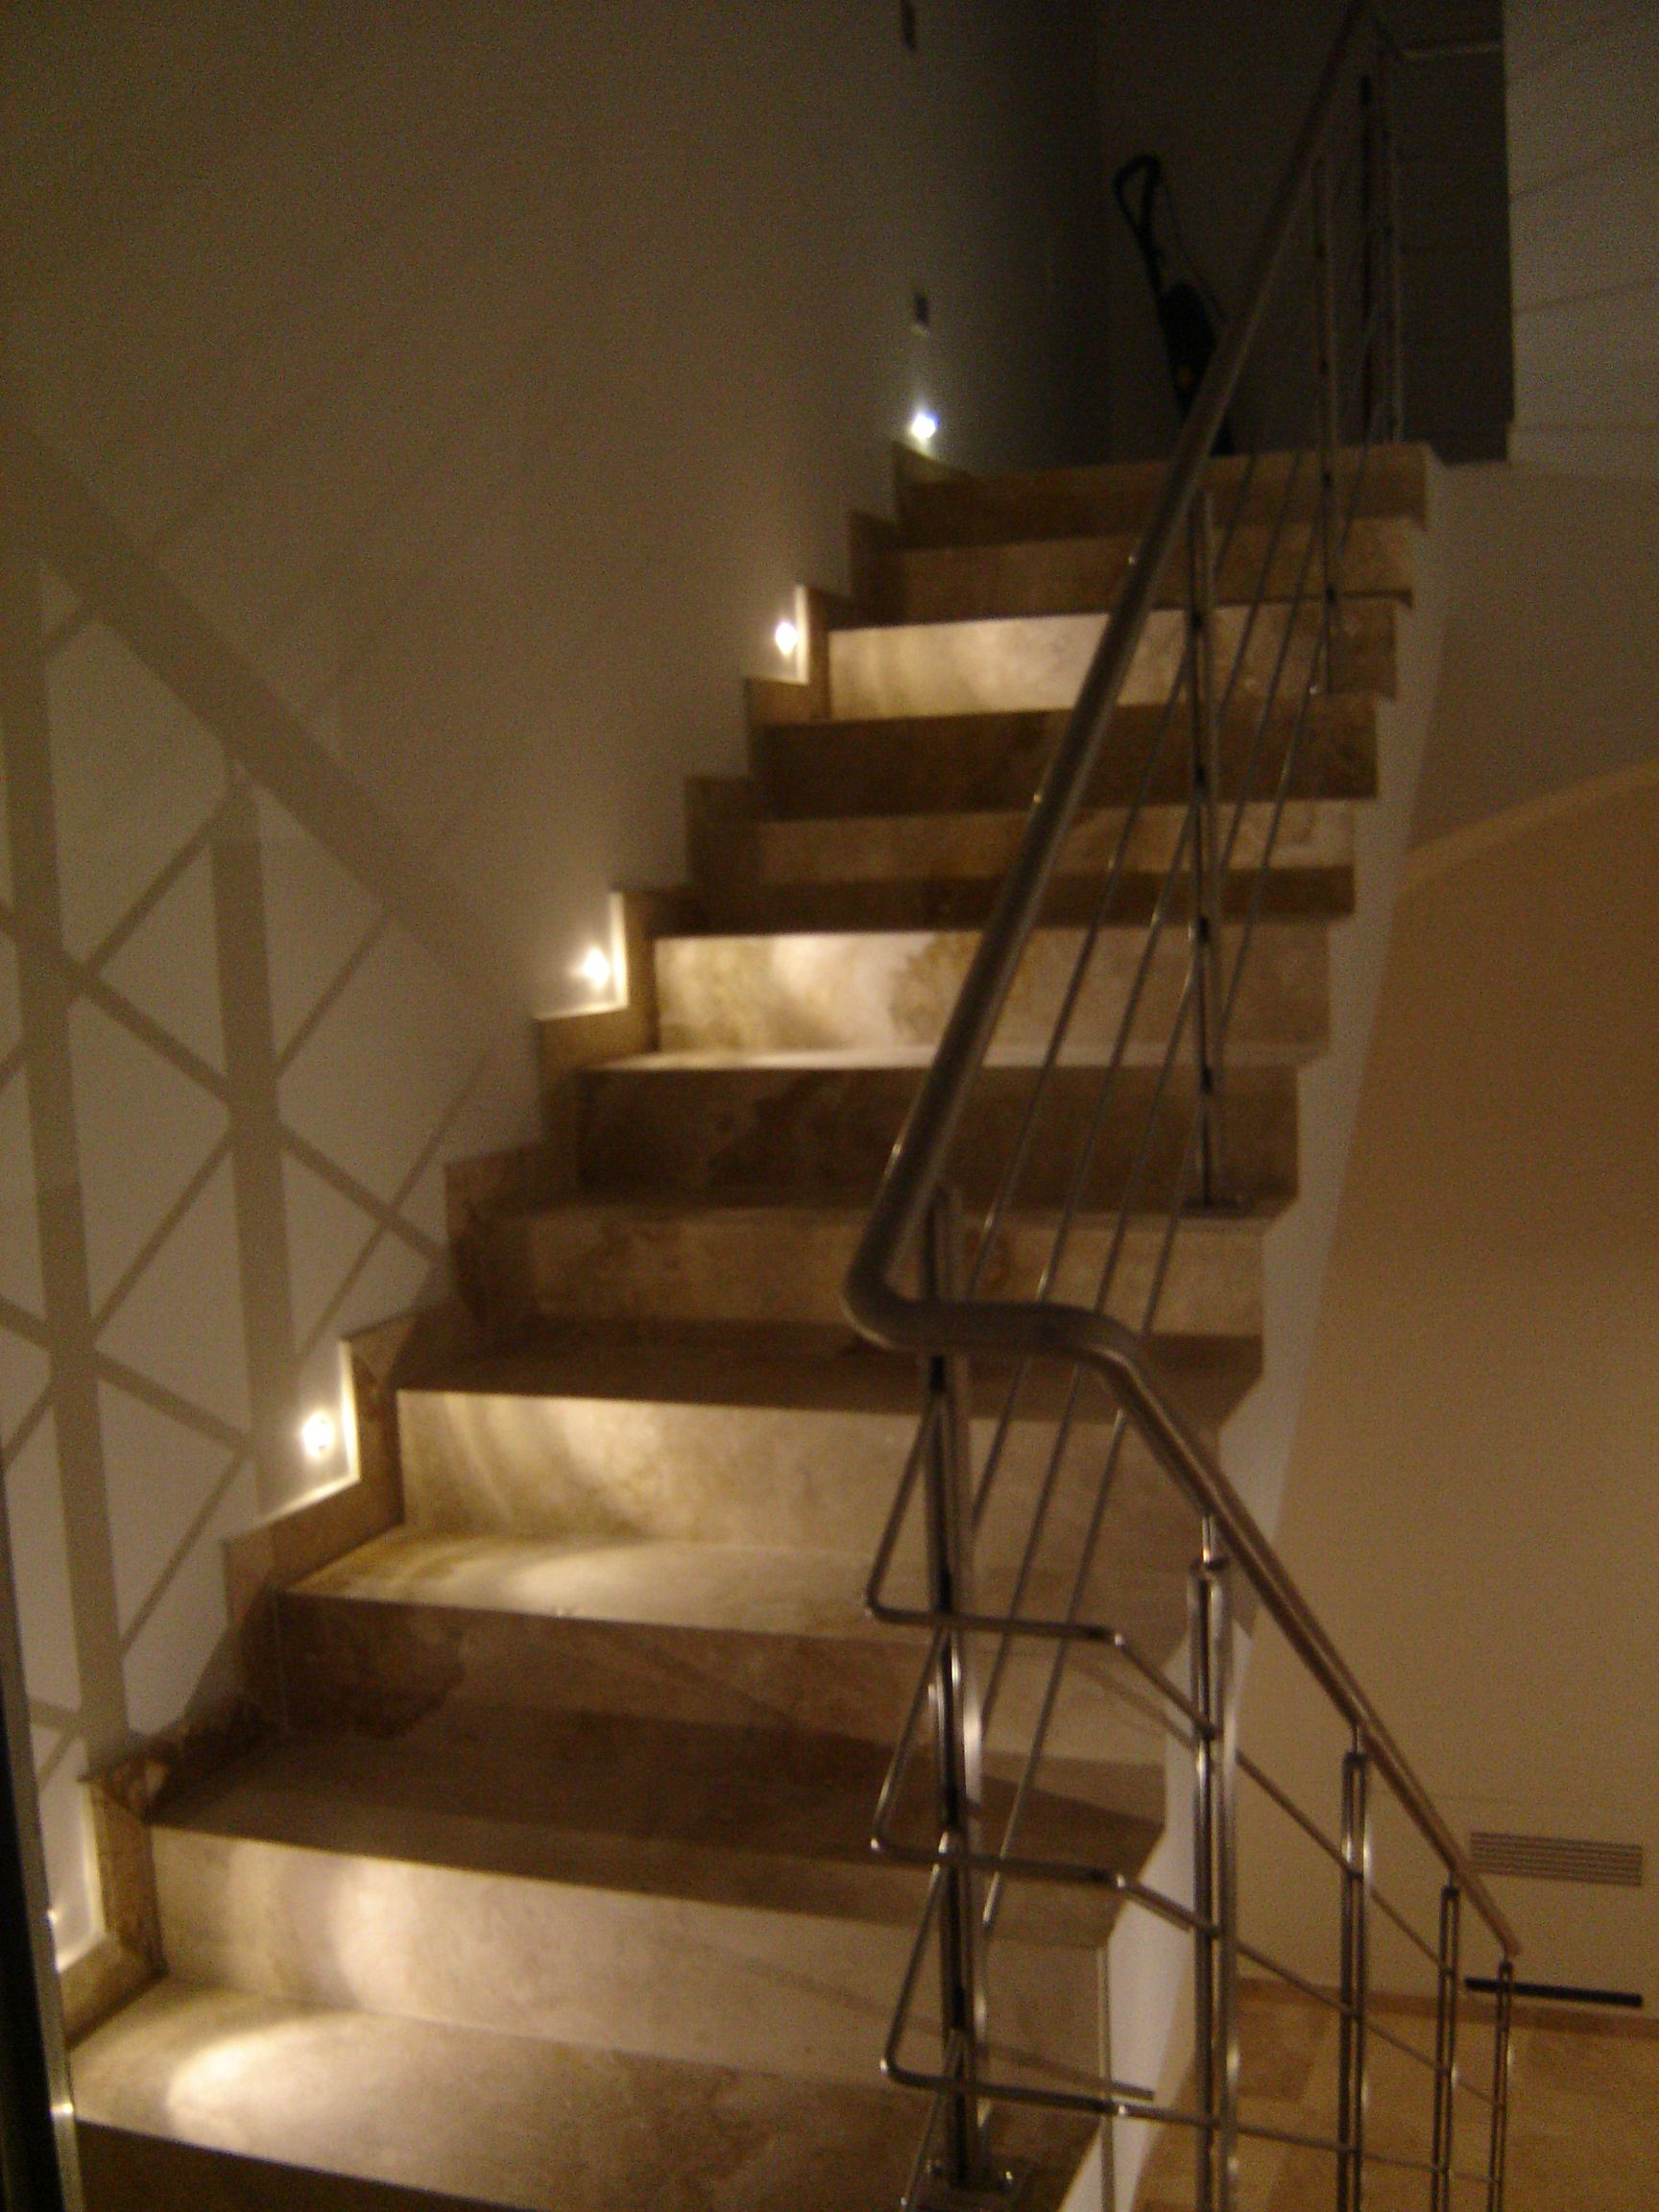 Illuminazione led scala la cava senese pinterest illuminazione led e scala - Luci per scale ...